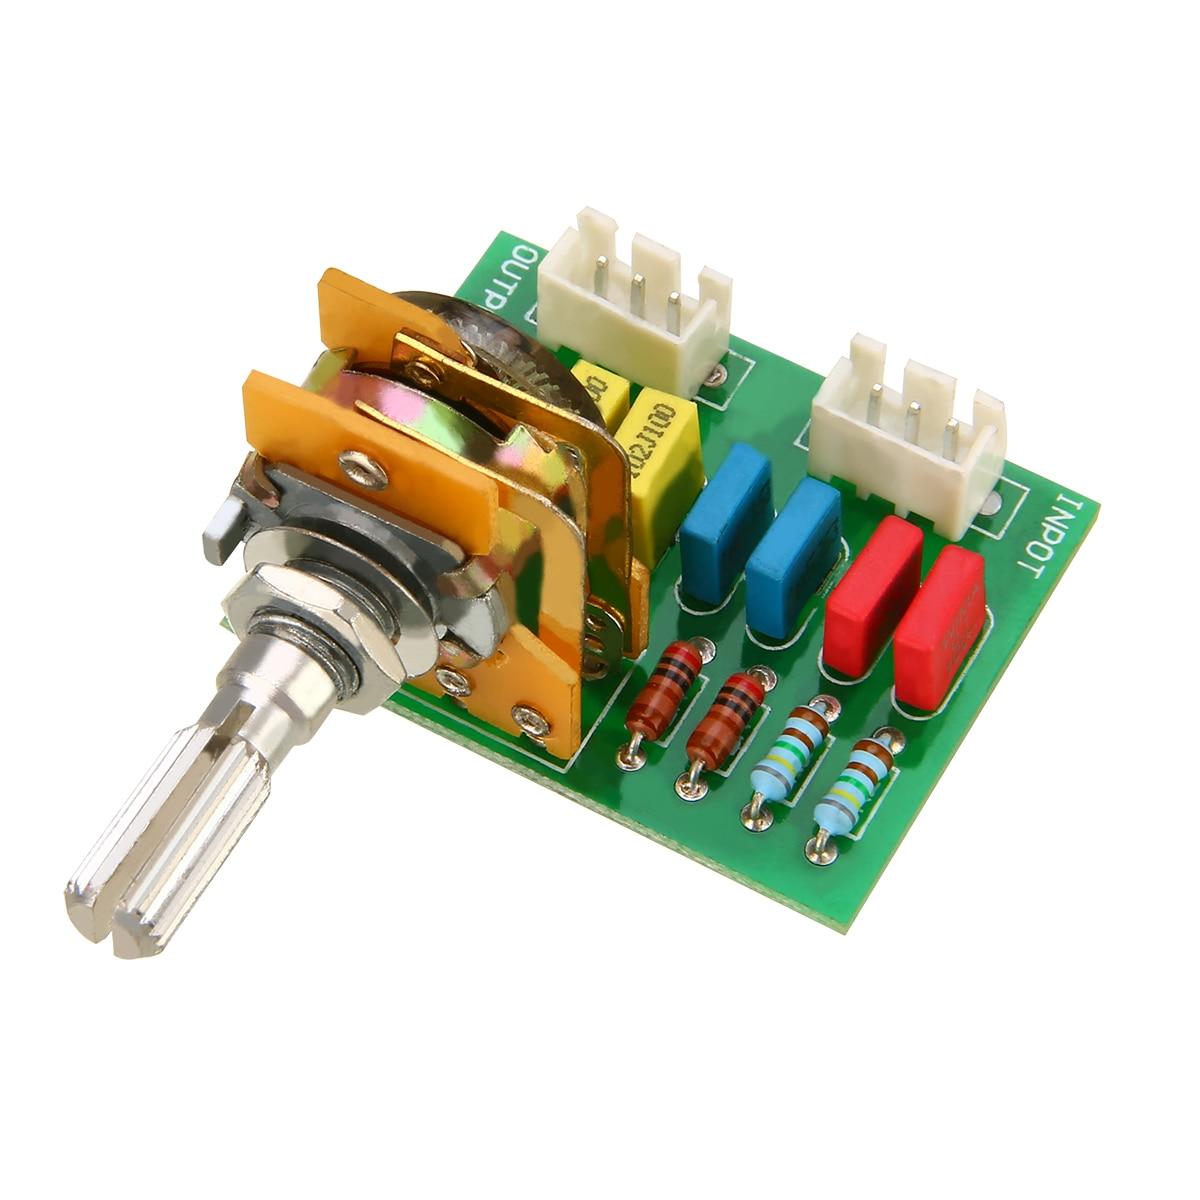 Mayitr Amplifier/Preamp Passive Tone Board Volume Control Sound Adjustable 16-type 50K 8-pin Passive Potentiometer Module